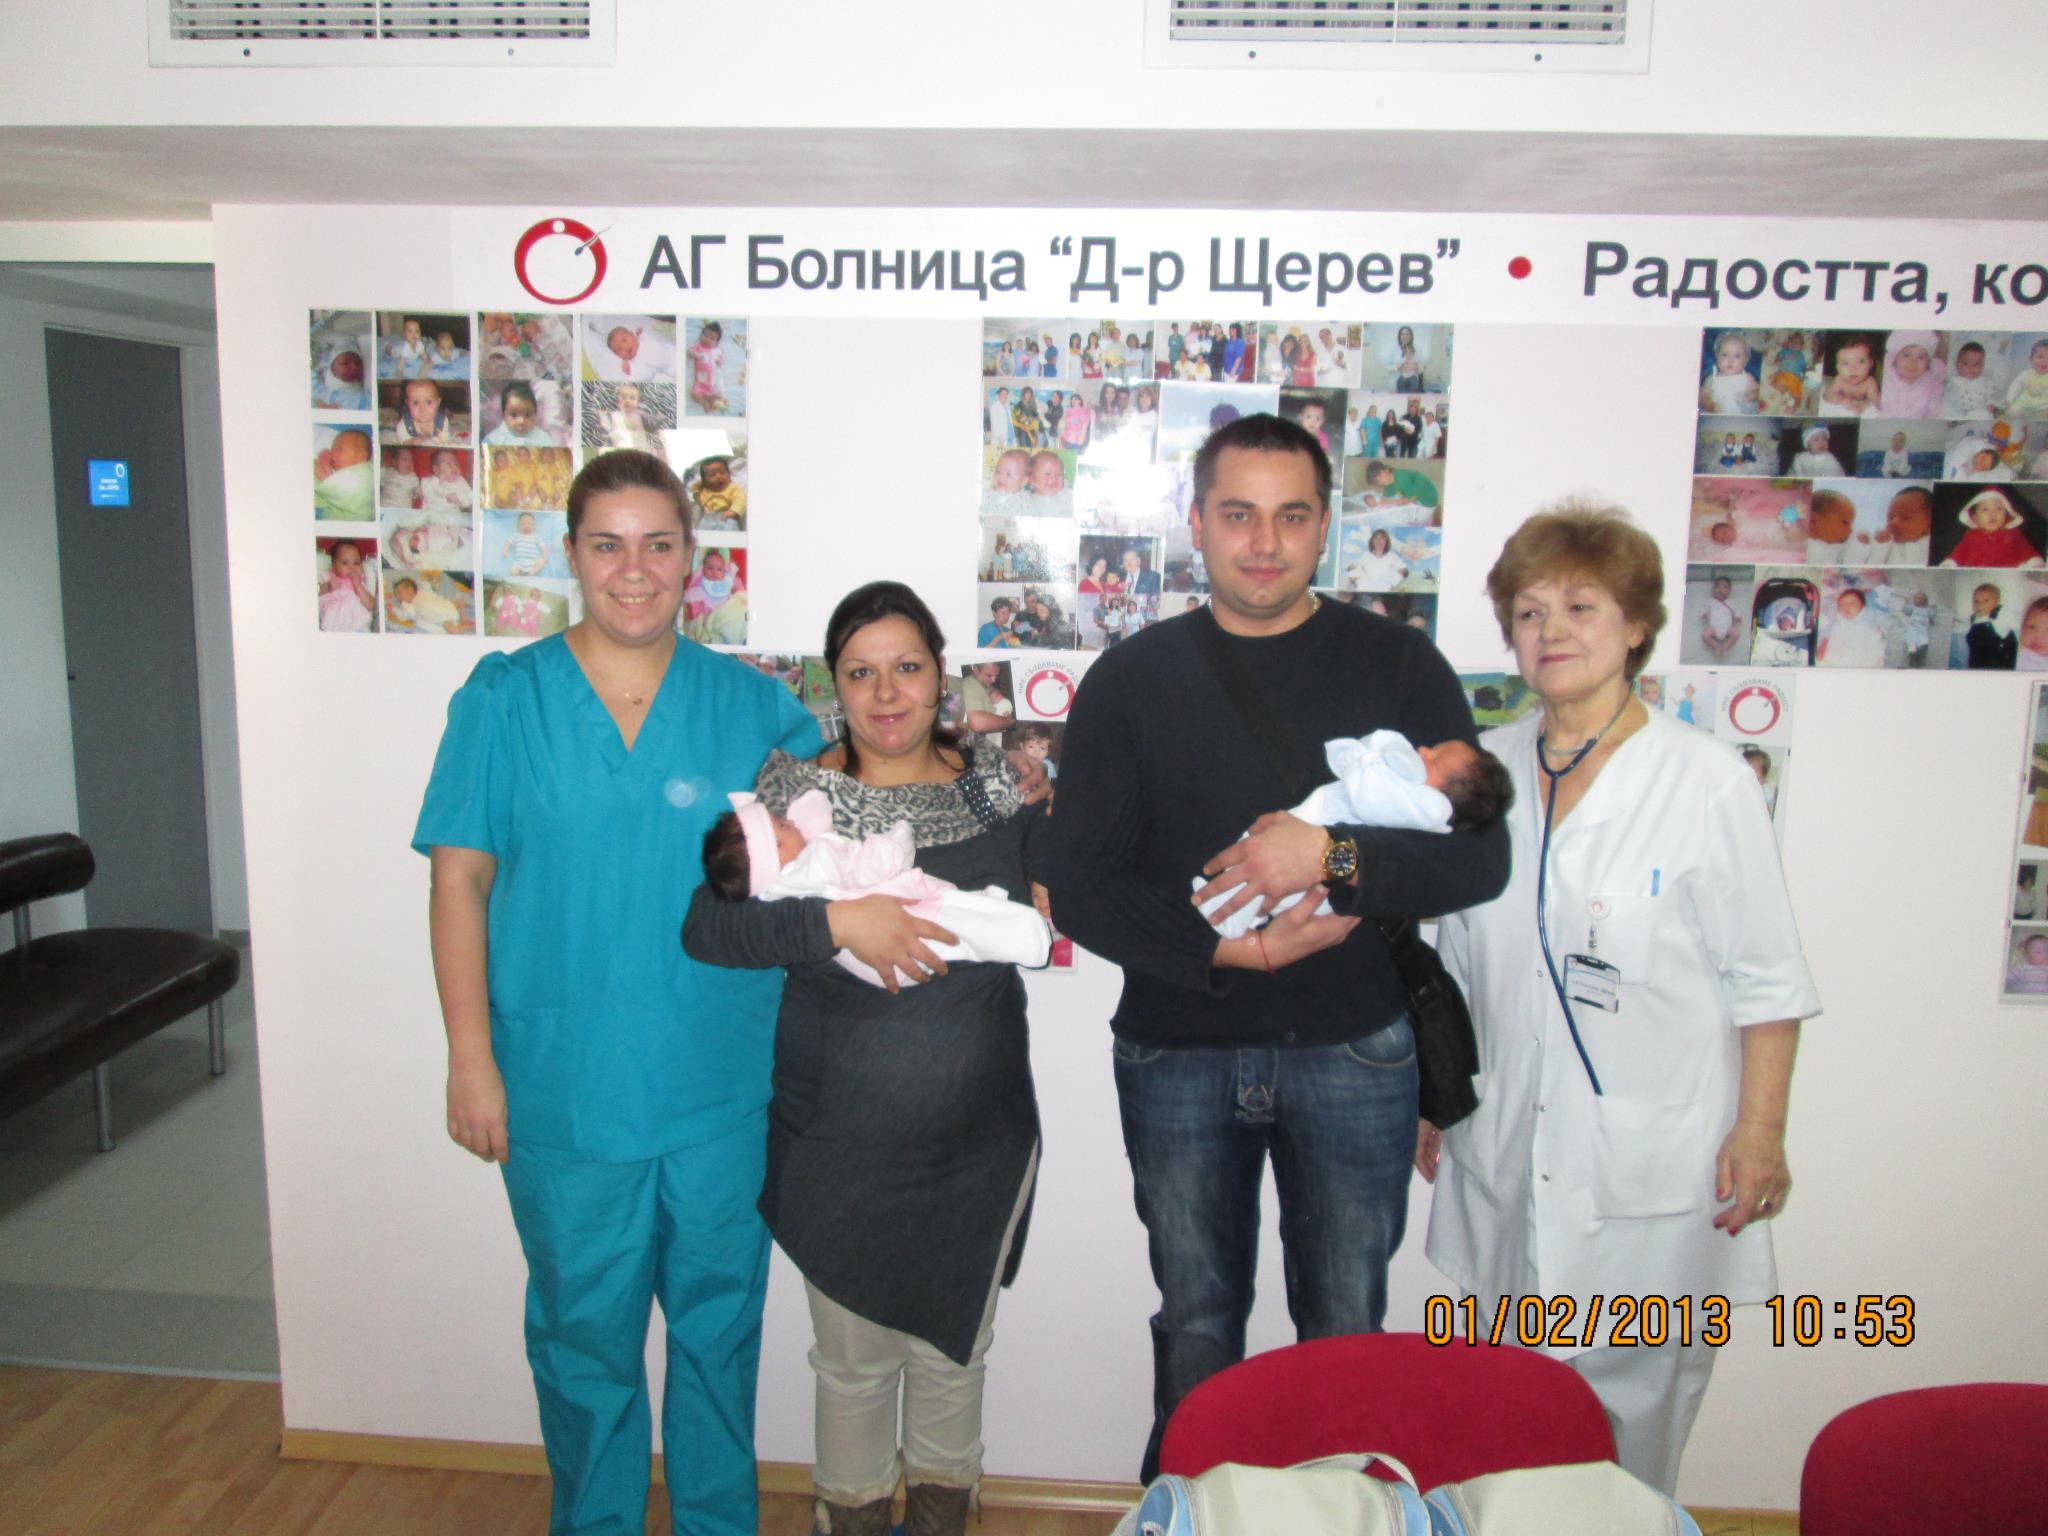 Gergana Firova 20.03.2013